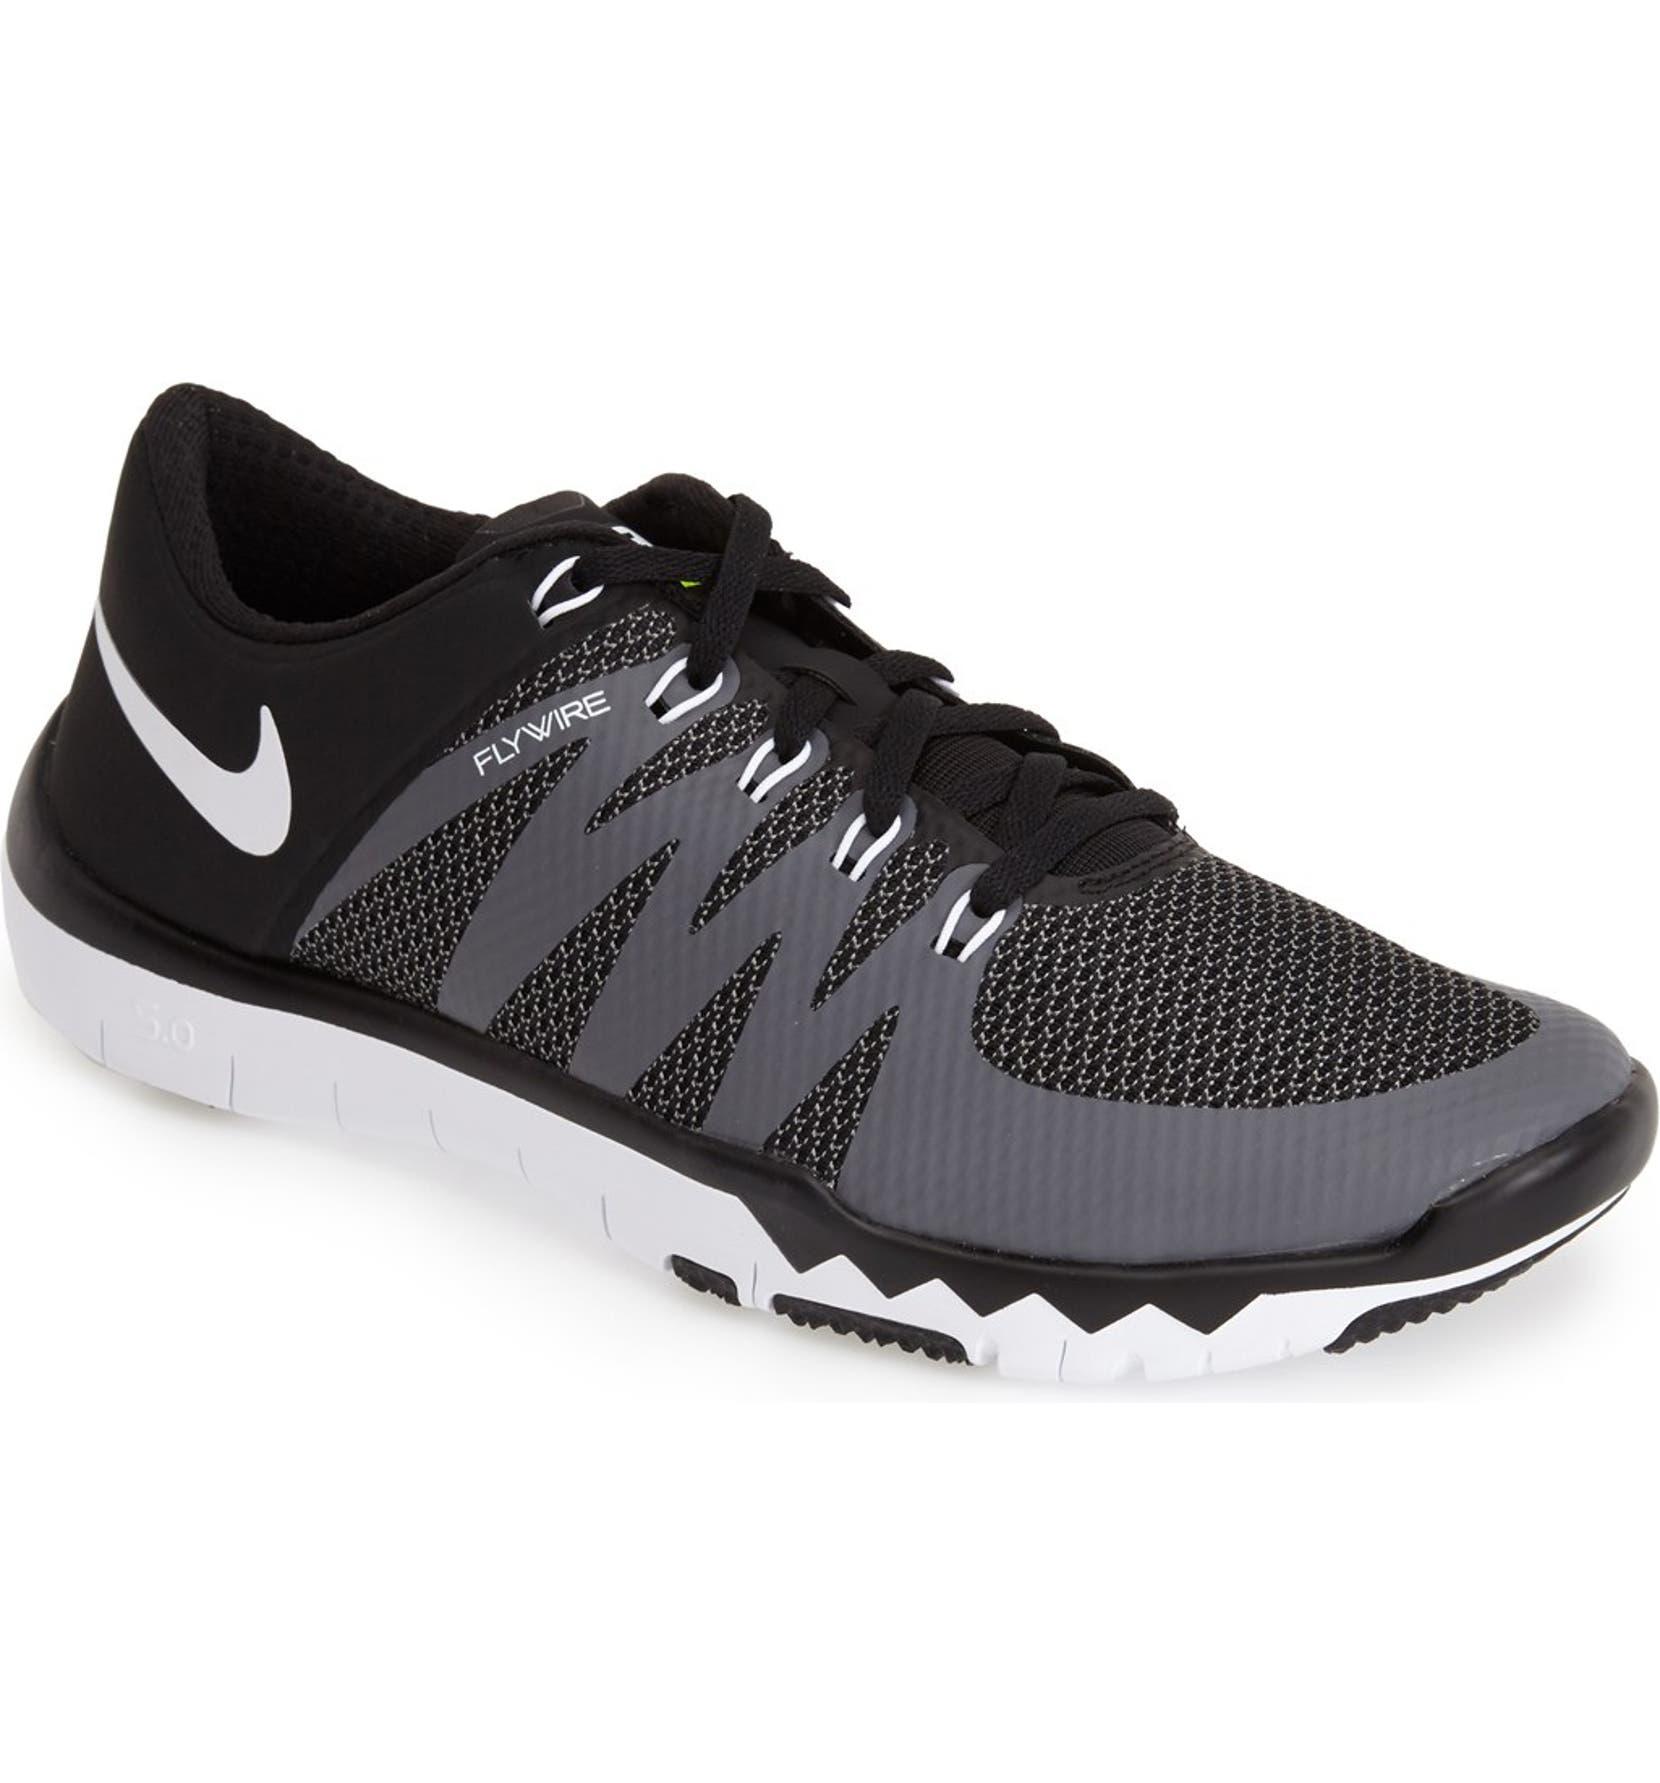 size 40 17199 61a40 Nike  Free Trainer 5.0 V6  Training Shoe (Men) (Online Only)   Nordstrom